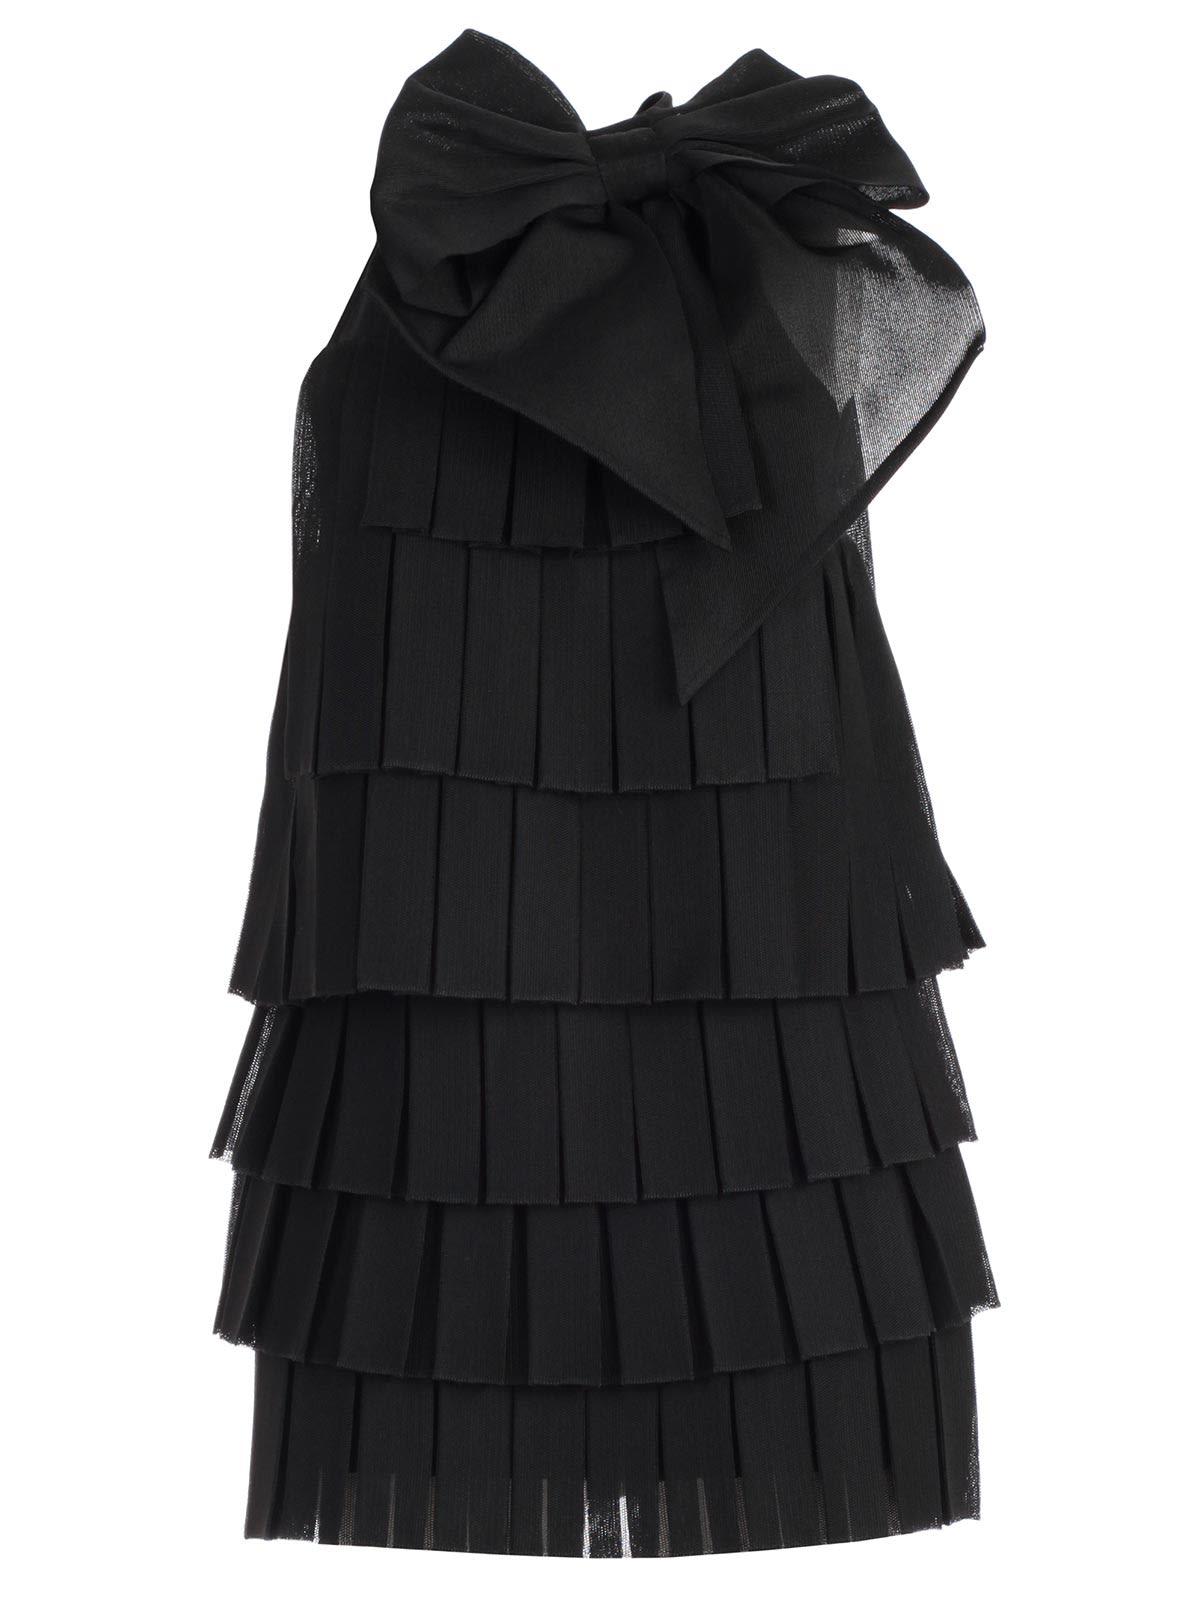 Balmain Dress W & s Bow Embellished Pleated